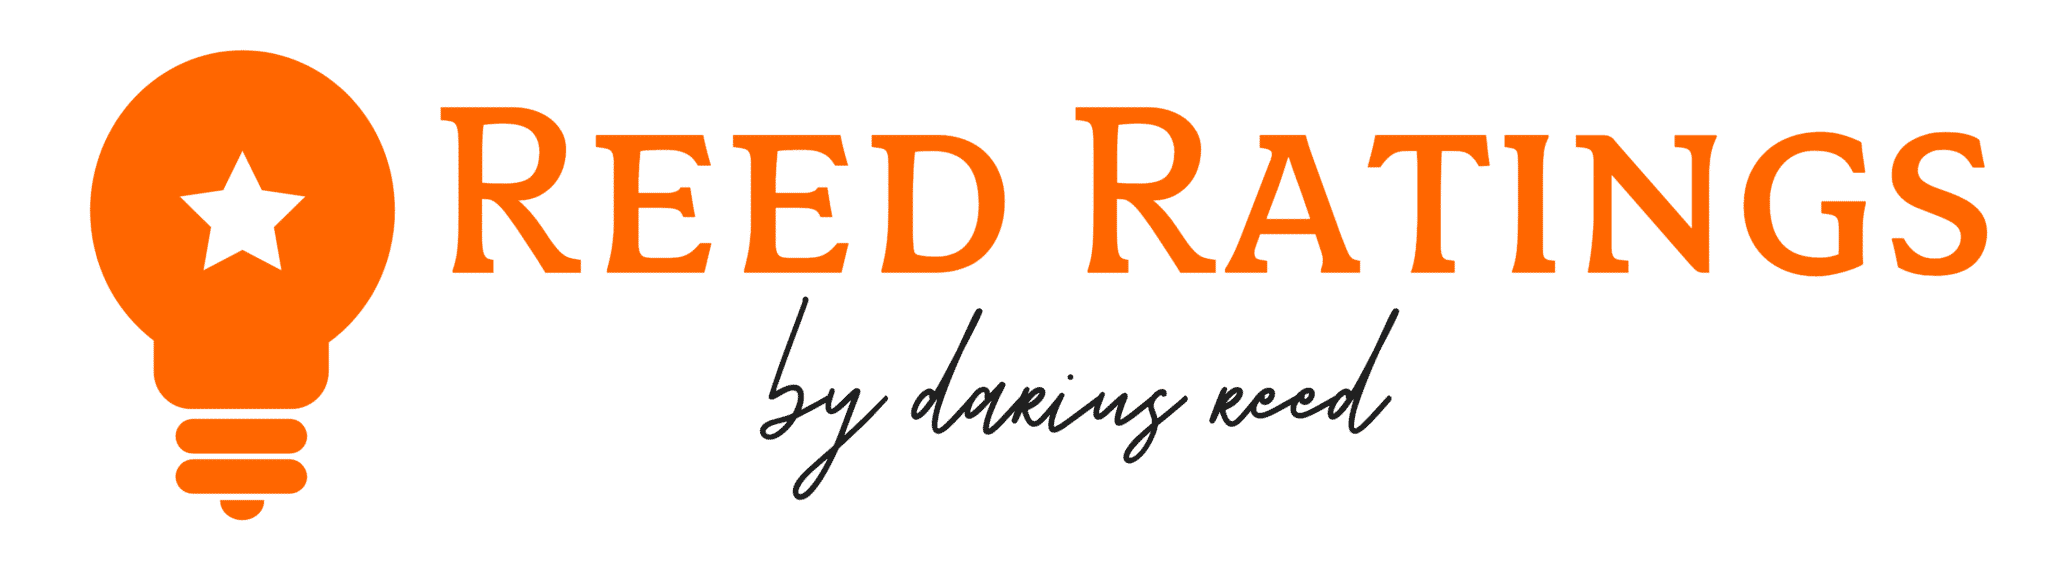 reed ratings logo